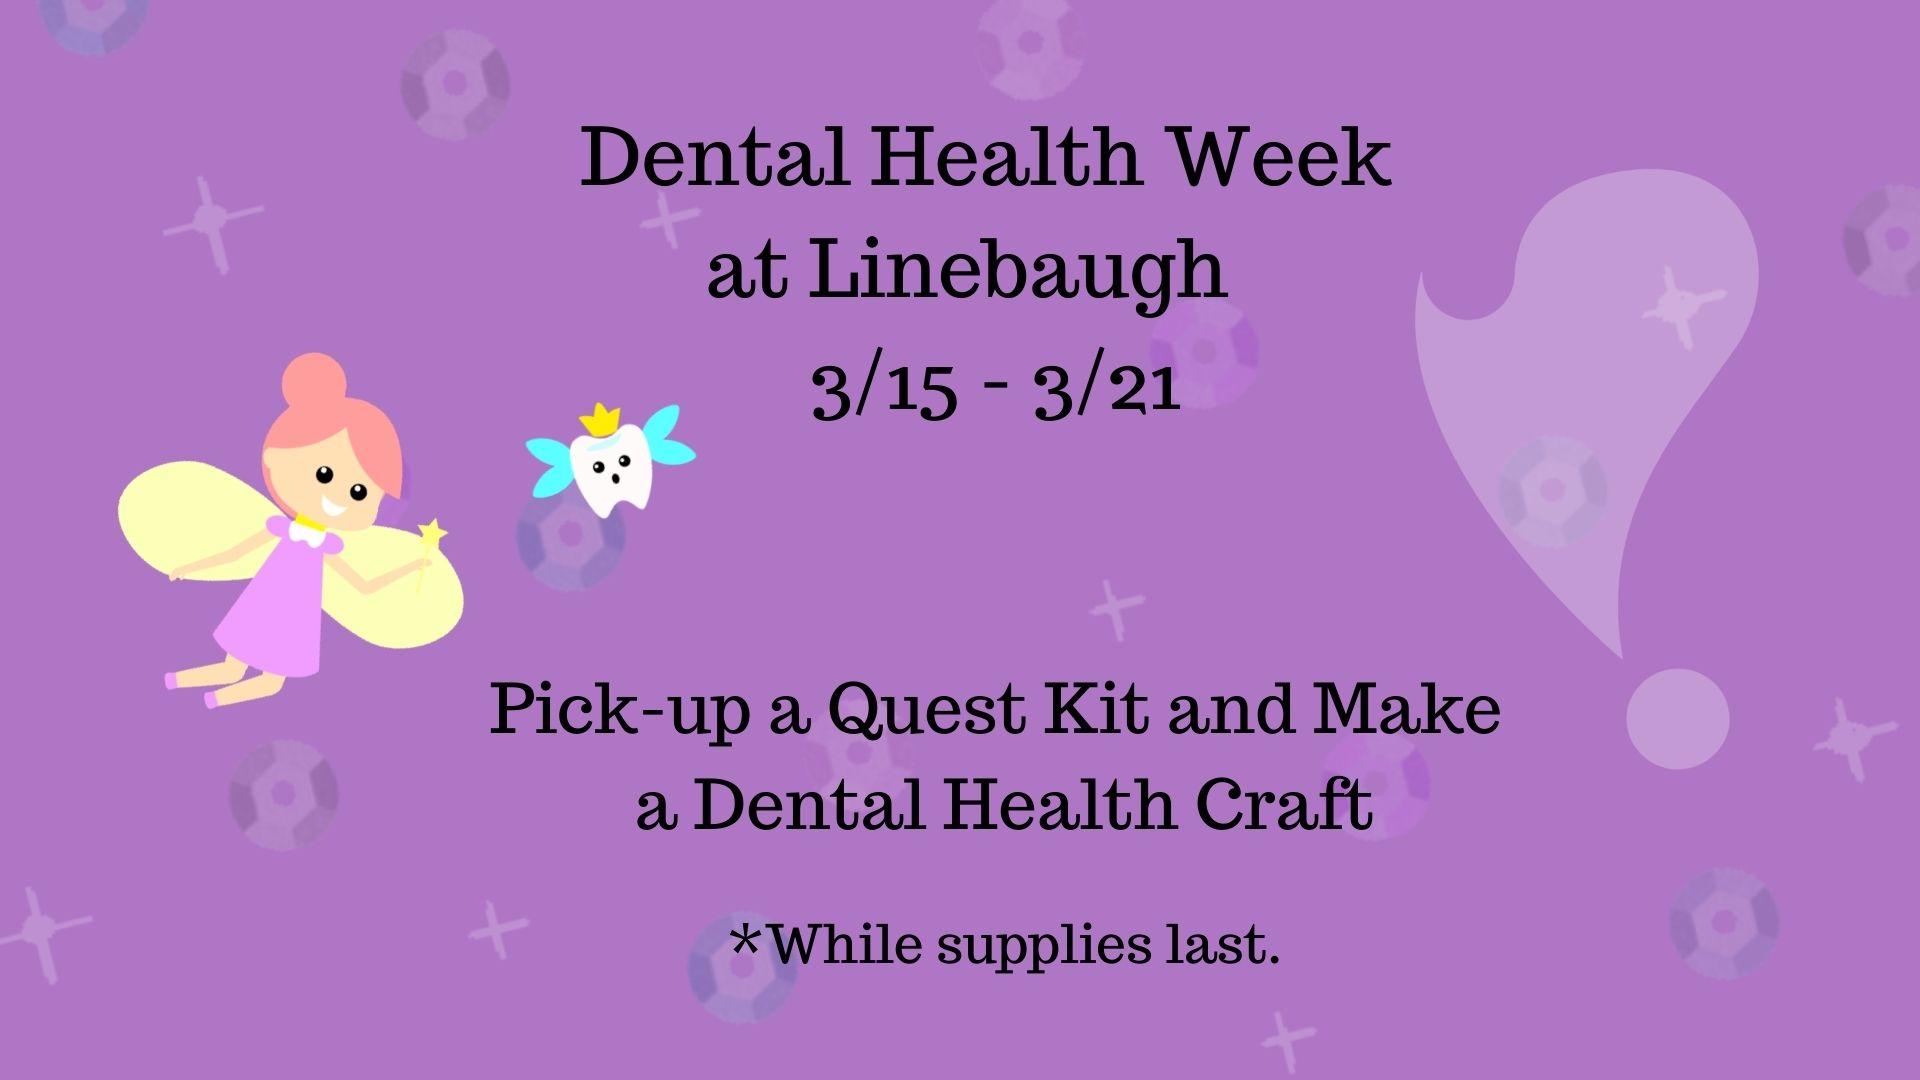 Dental Health Week at Linebaugh